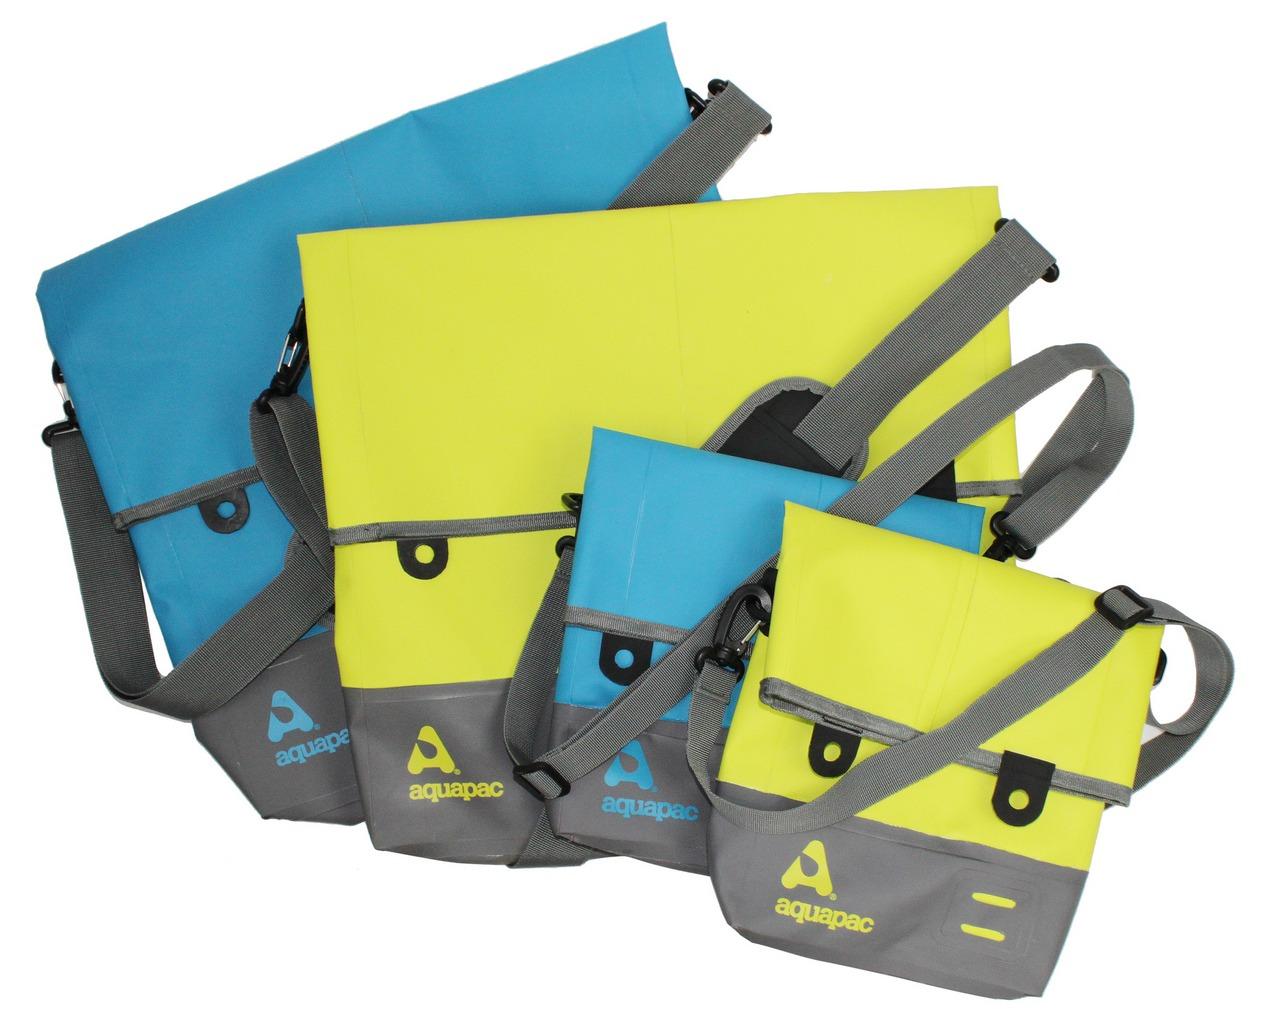 Брызгозащитная сумка Aquapac 053 - TrailProof™ Tote Bag – Large.. Aquapac - №1 в мире водонепроницаемых чехлов и сумок. Фото 1